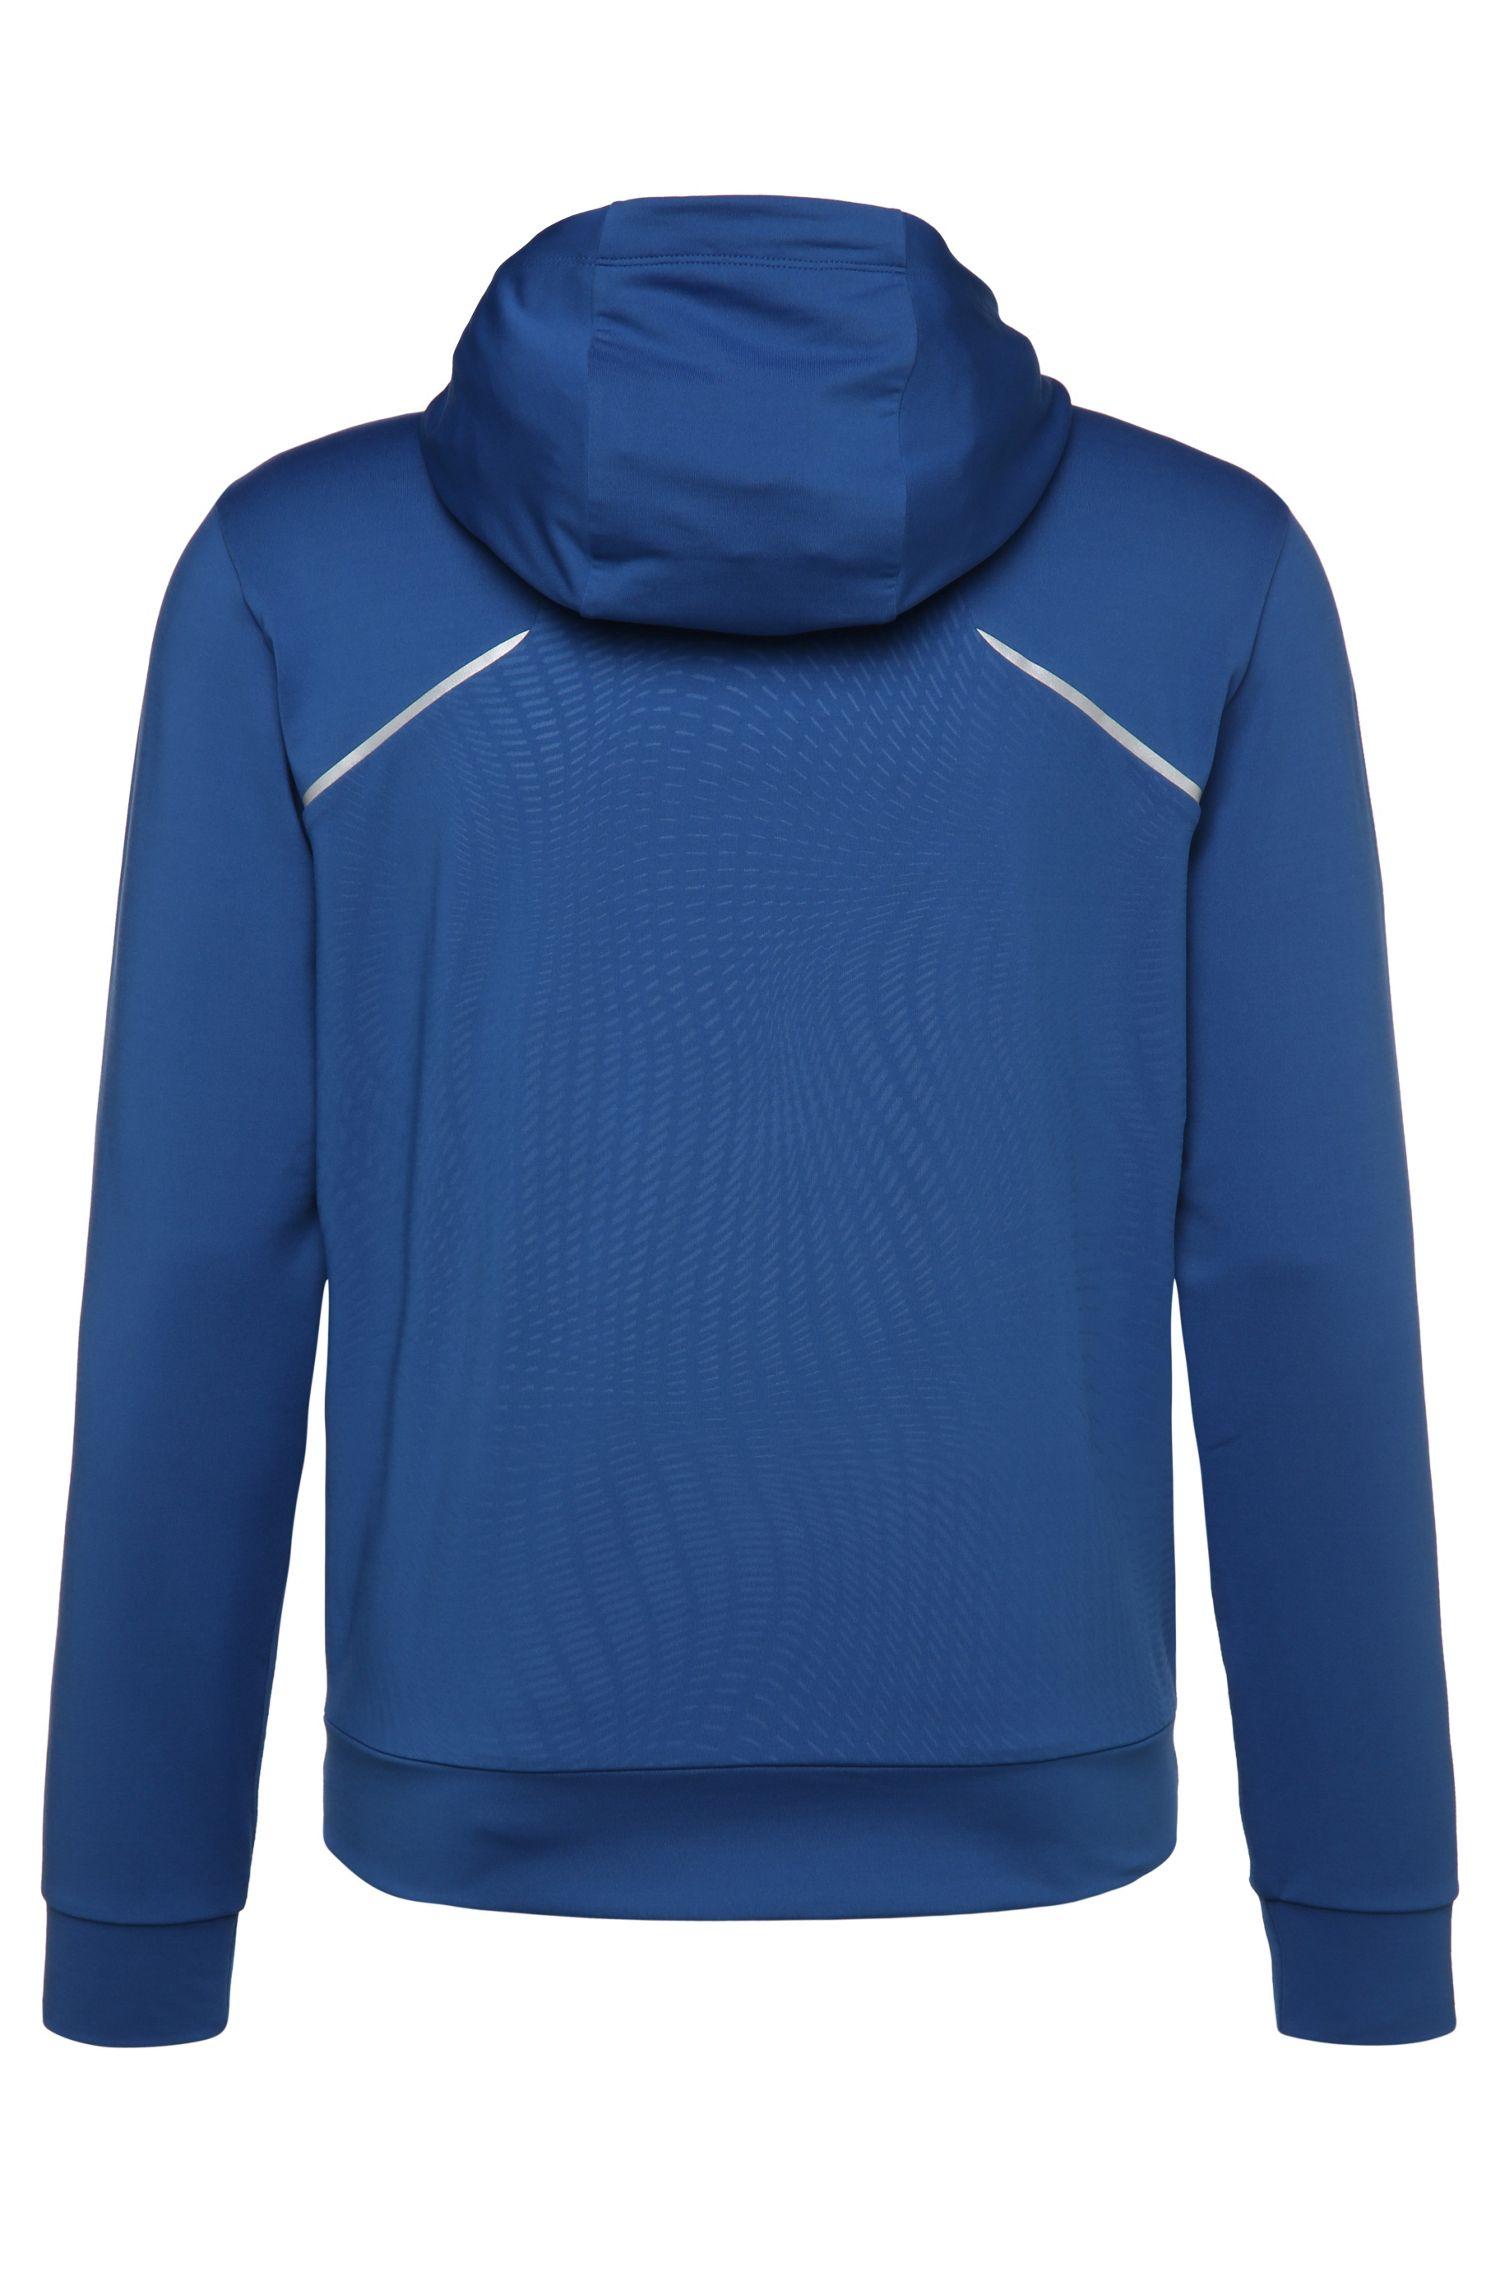 Regular-Fit Sweatshirt-Jacke aus elastischem Material-Mix: ´Saggytech`